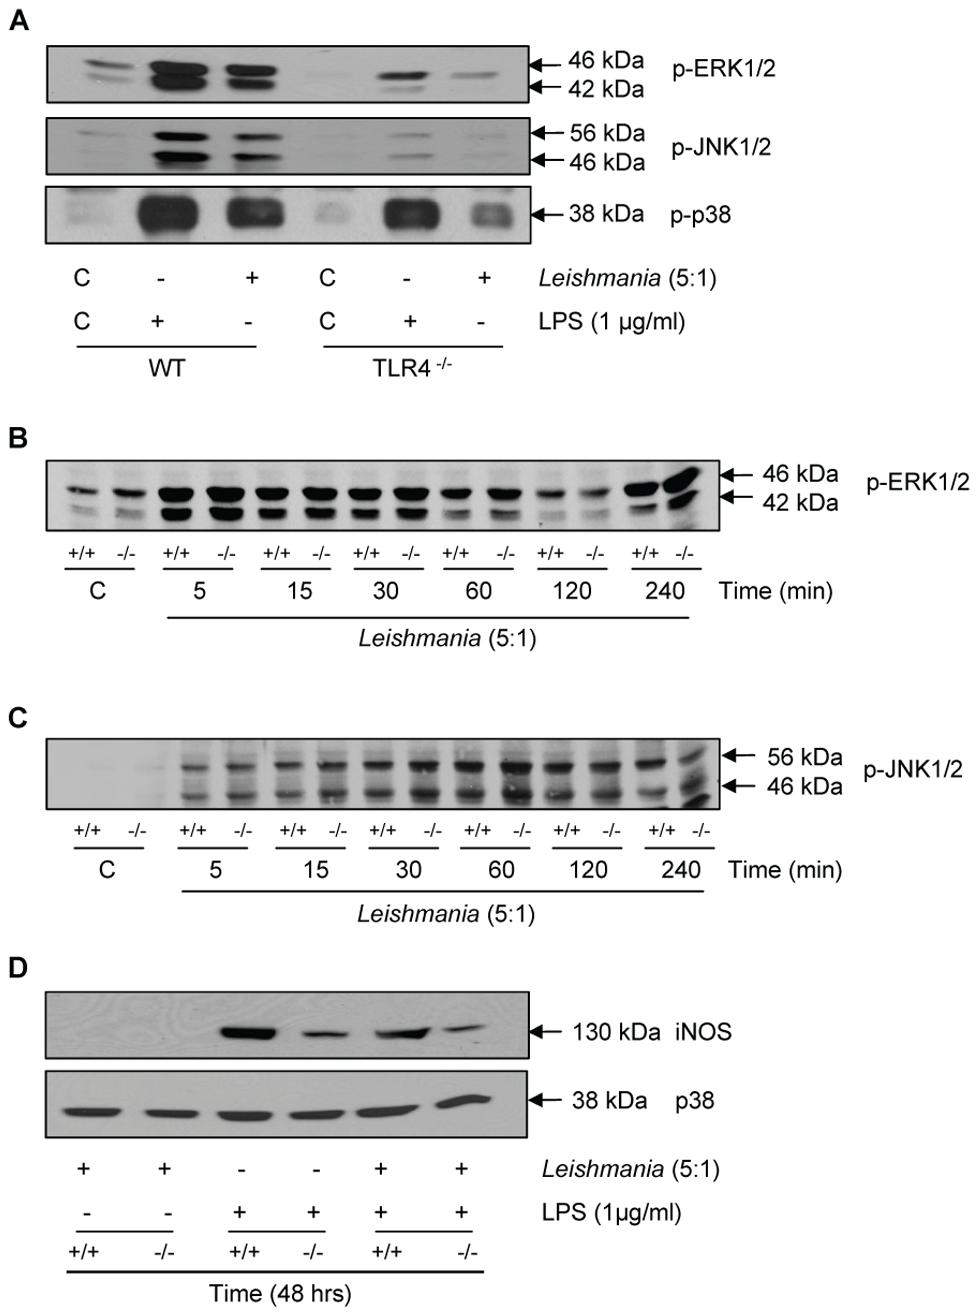 Macrophage activation by <i>Leishmania mexicana</i>.